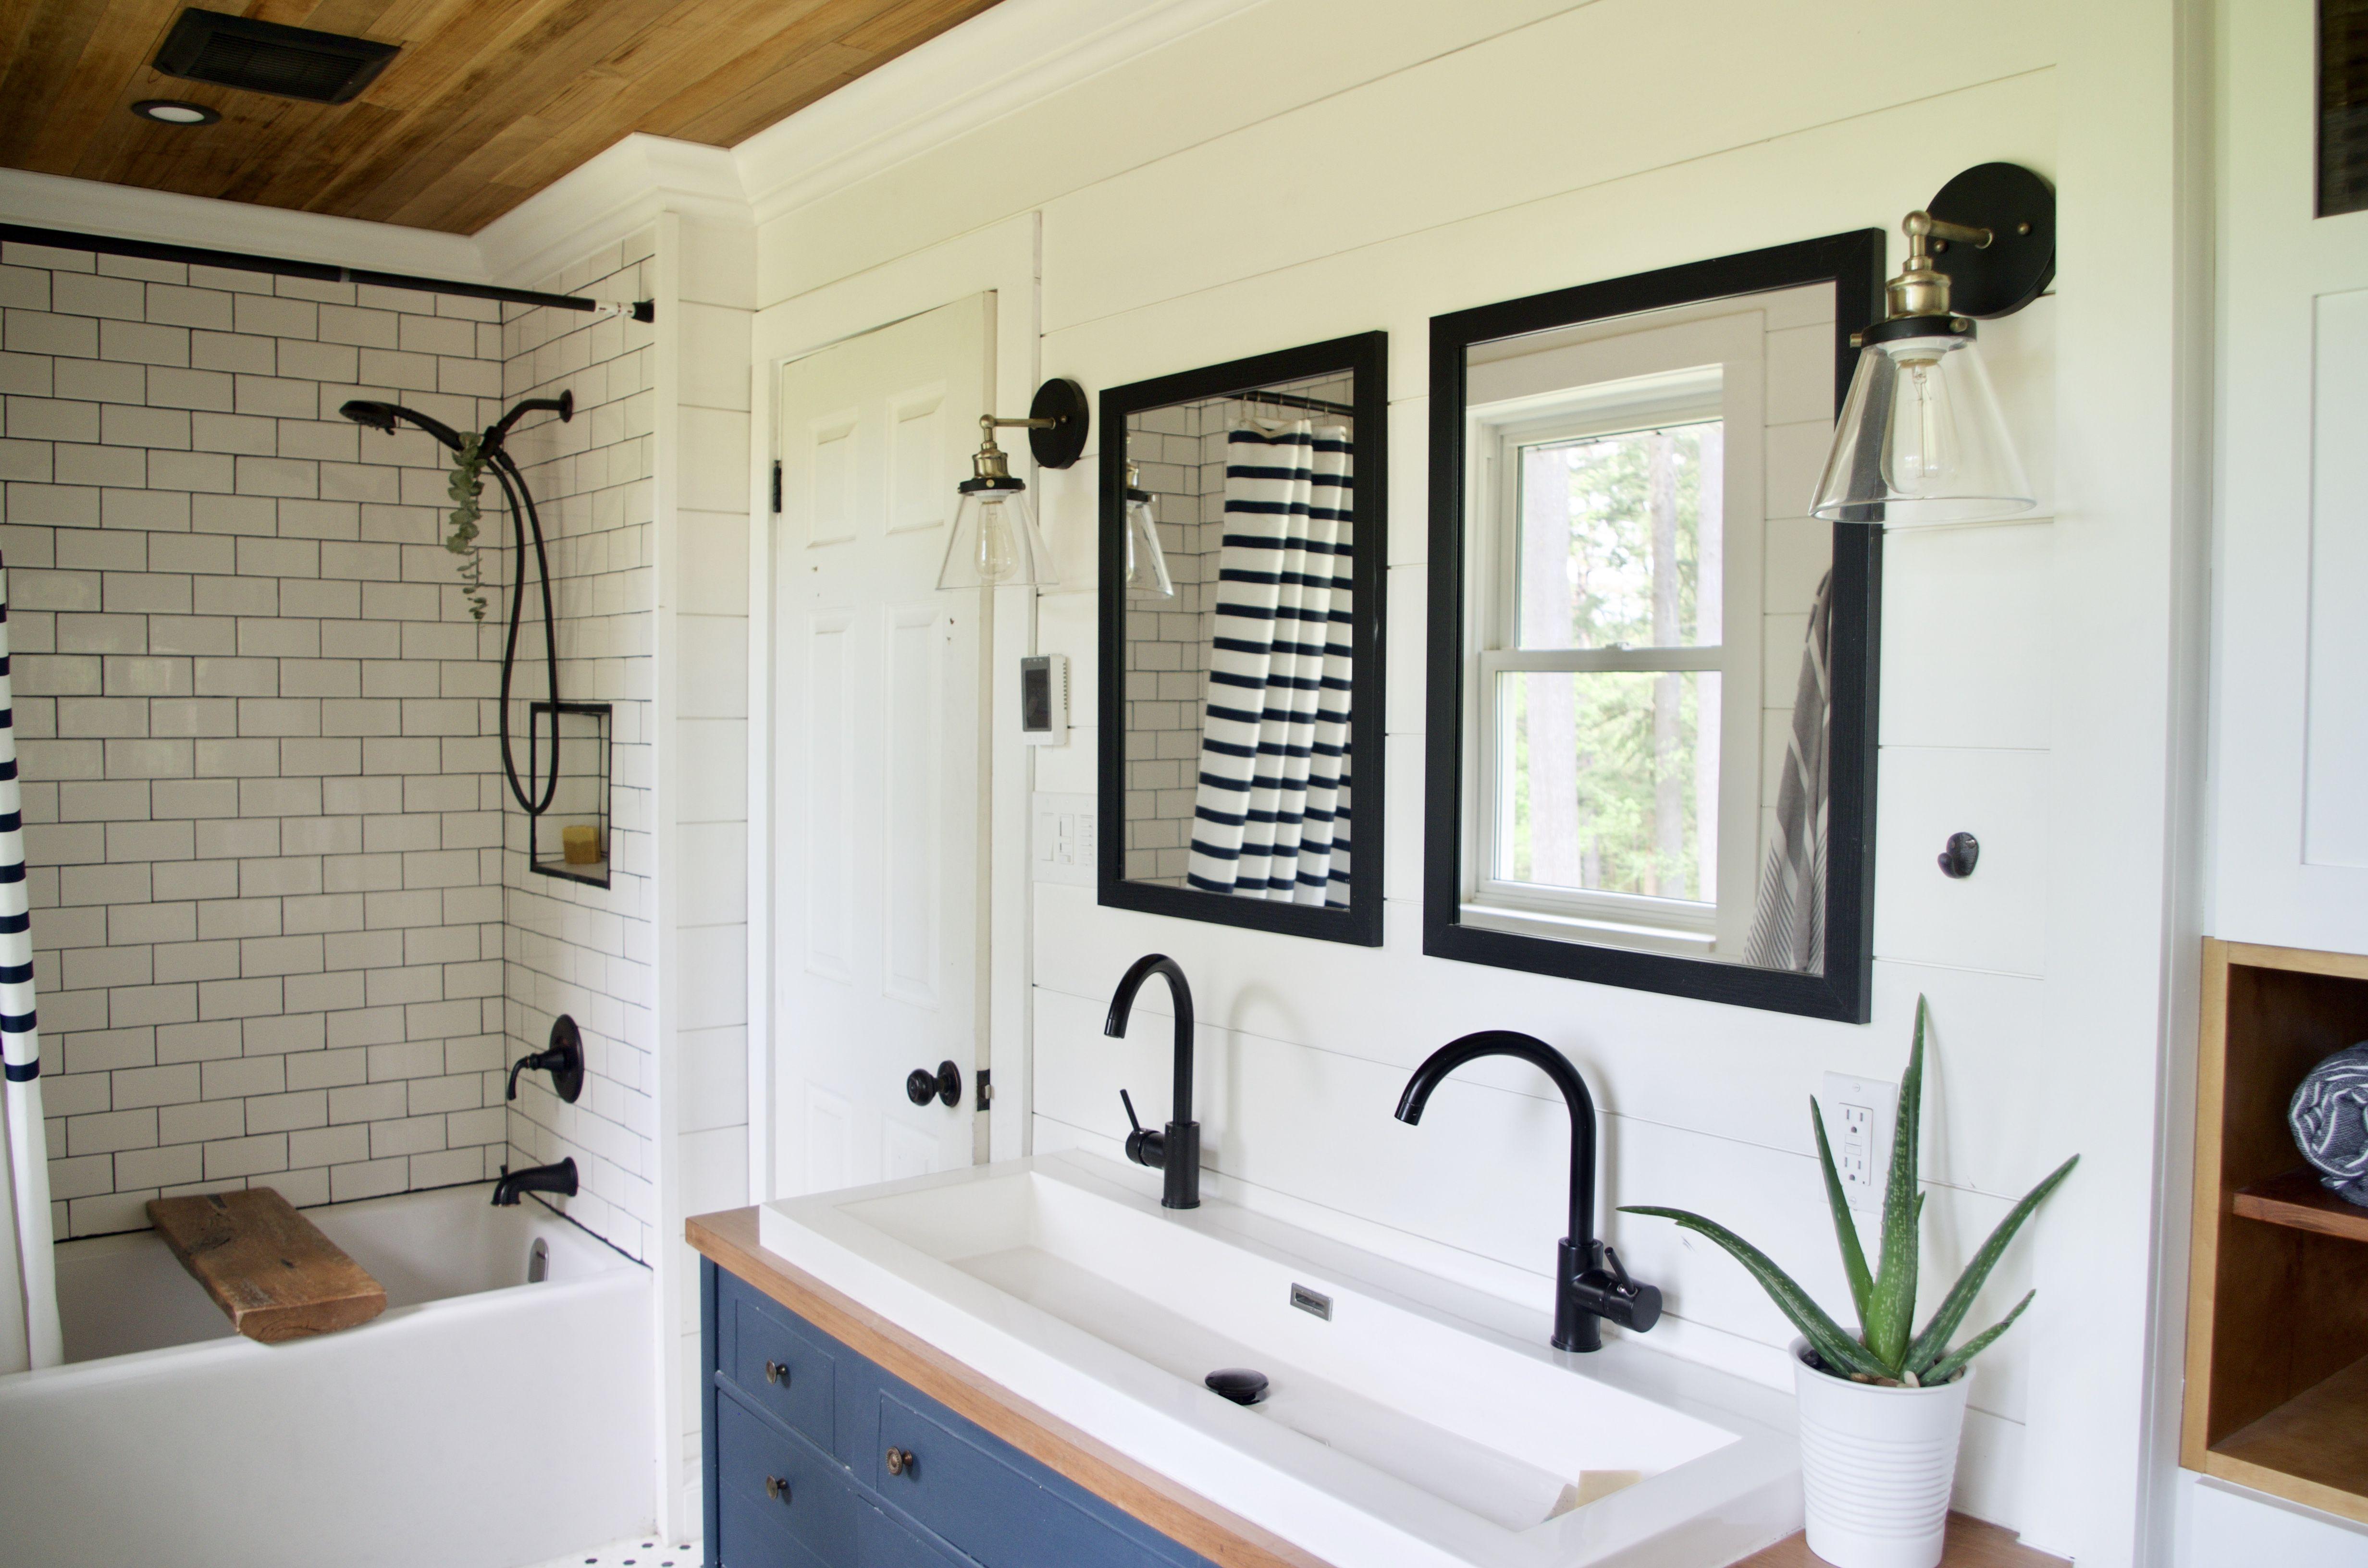 Furniture Creating Trough Bathroom Sink With Two Faucets Remodelingremodeling A Trough Bathroom Sink With Two Faucets Interiorredesignexchange Trough Sinks